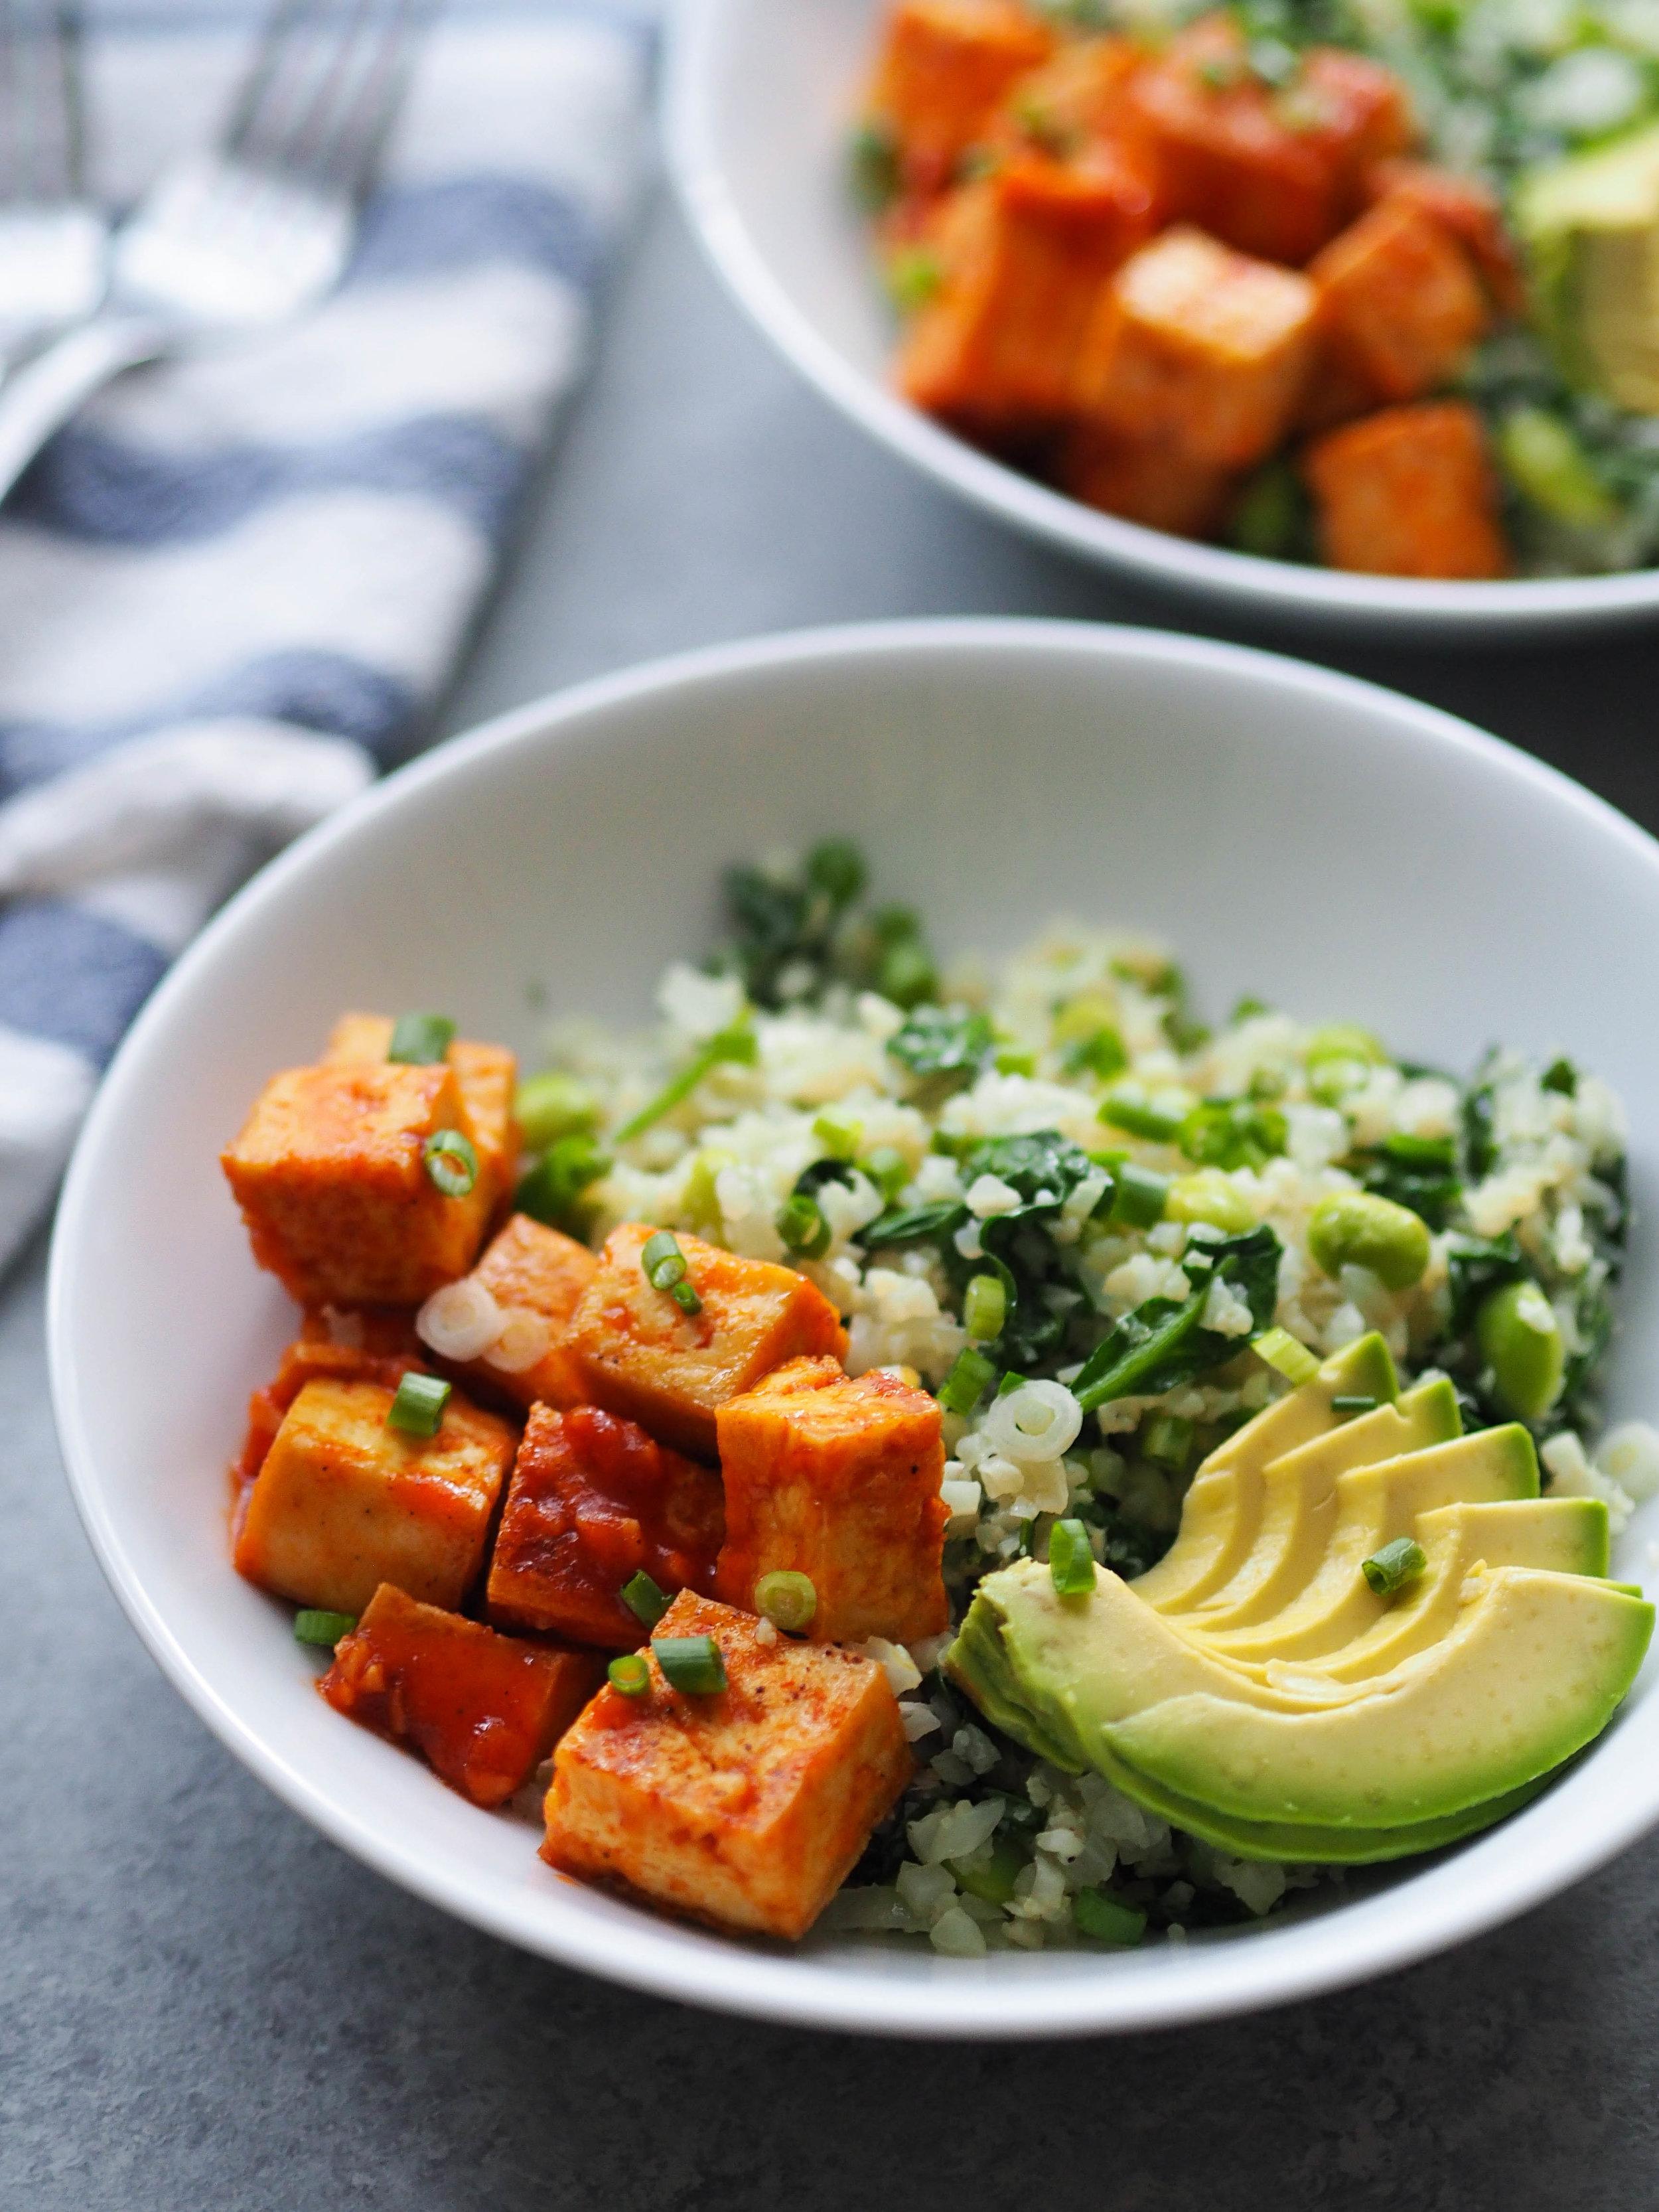 Sriracha-Lime Tofu Cauliflower Rice Bowl! Top garlicky sauteed cauliflower rice with crispy baked tofu in a spicy sriracha-lime sauce! Packed with protein and veggies! #vegan #vegetarian #healthyrecipe #cauliflower #tofu #glutenfree